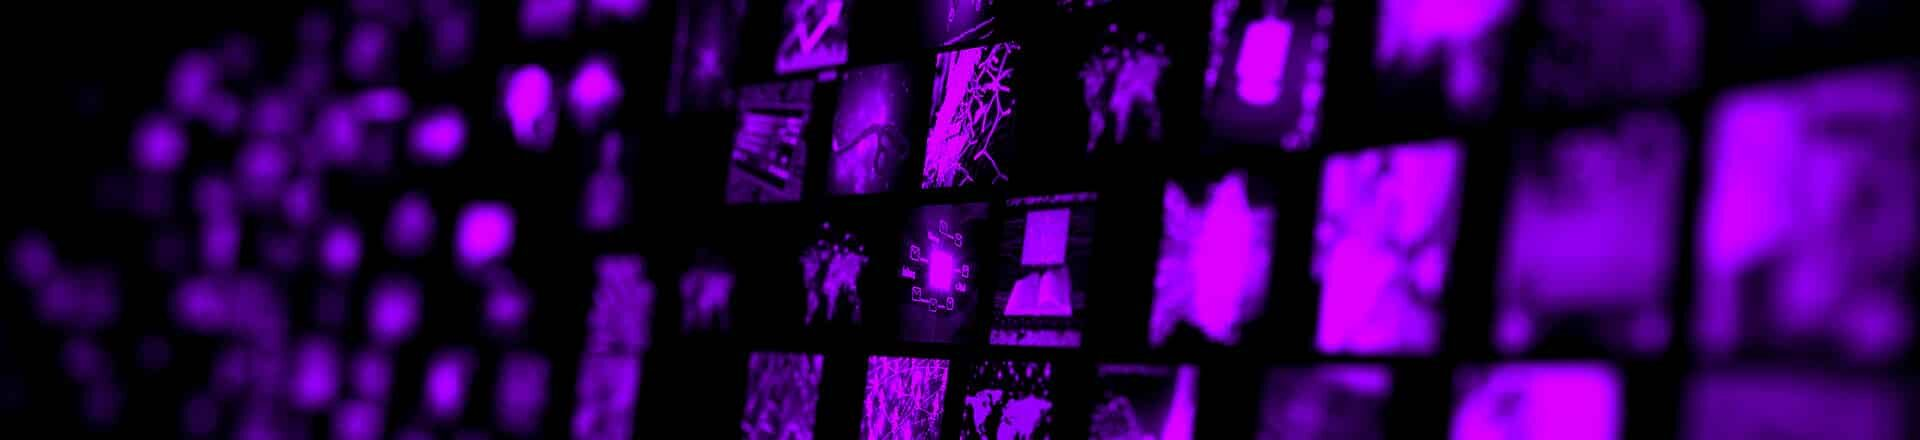 forehead_desktop_p-4